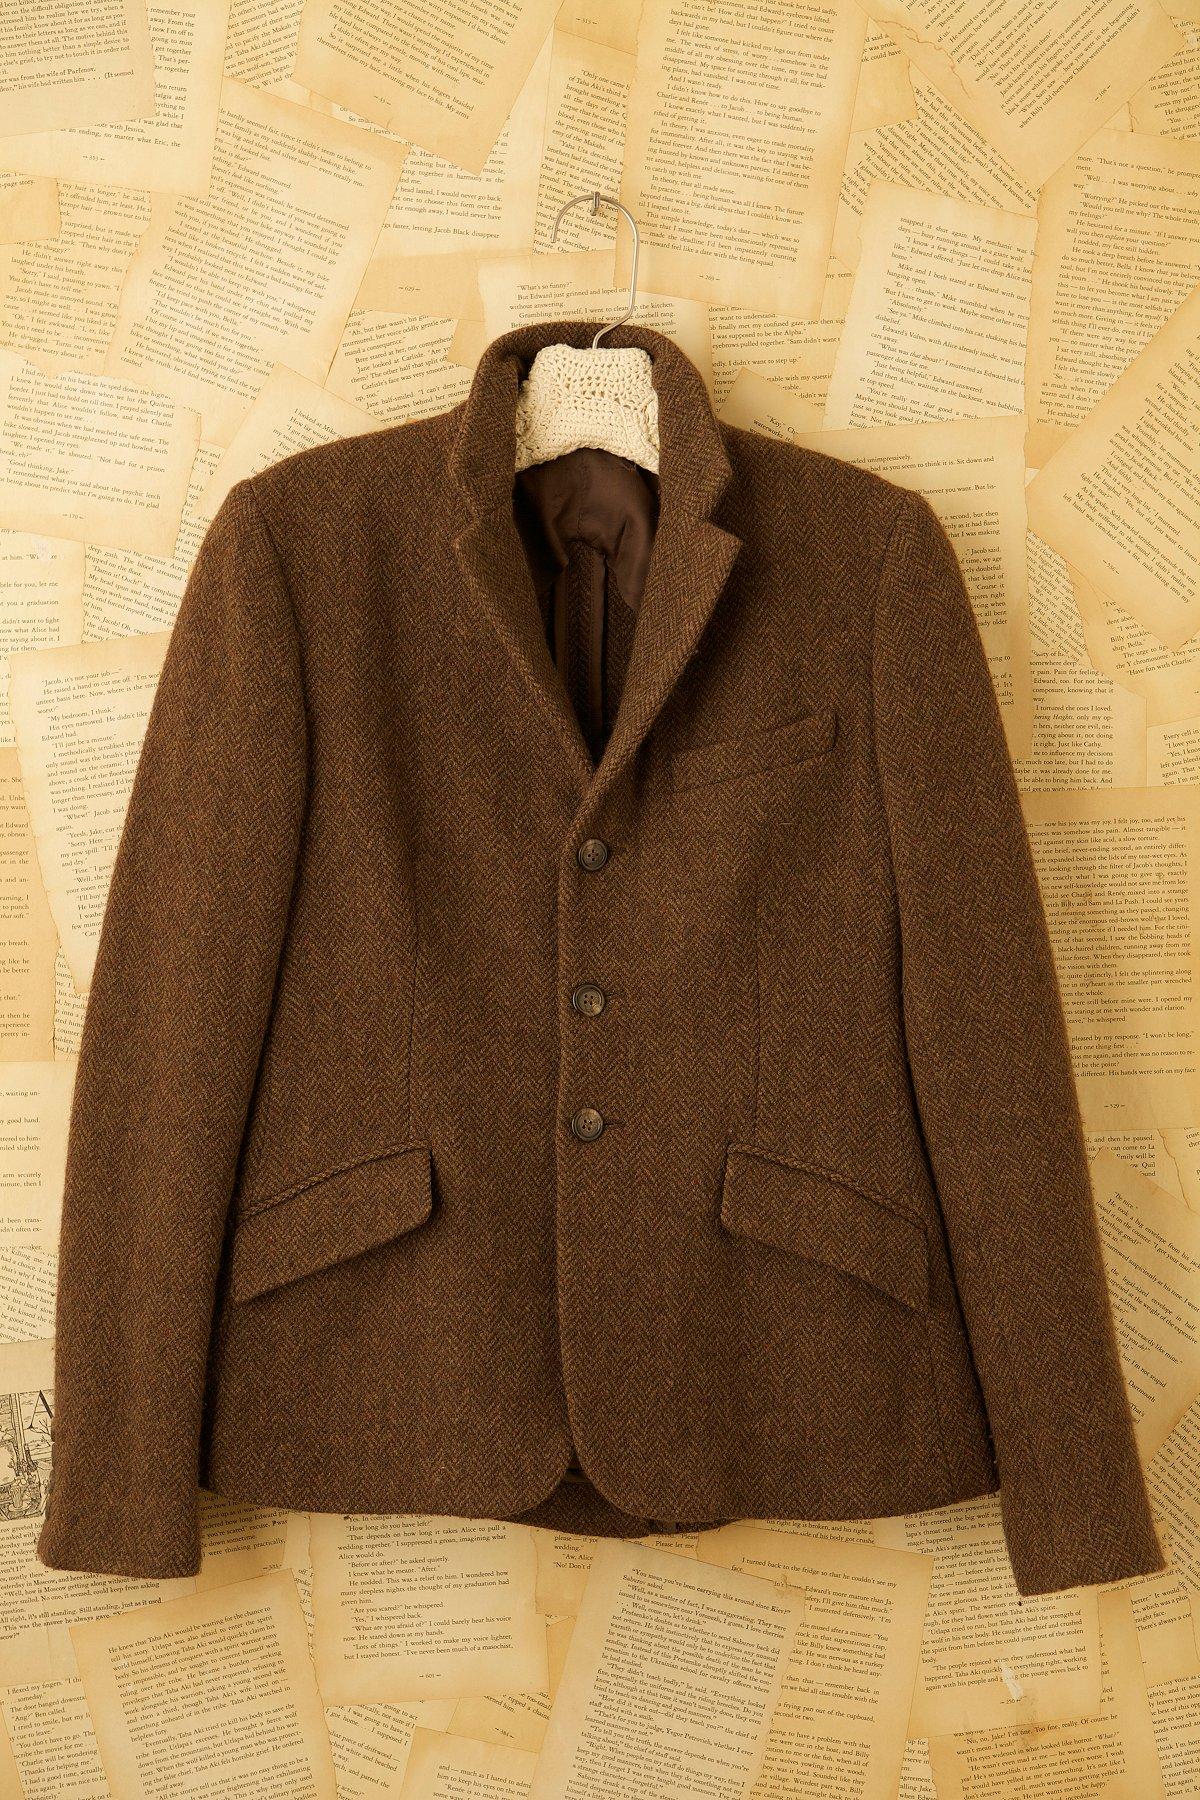 Vintage Cashmere Riding Jacket